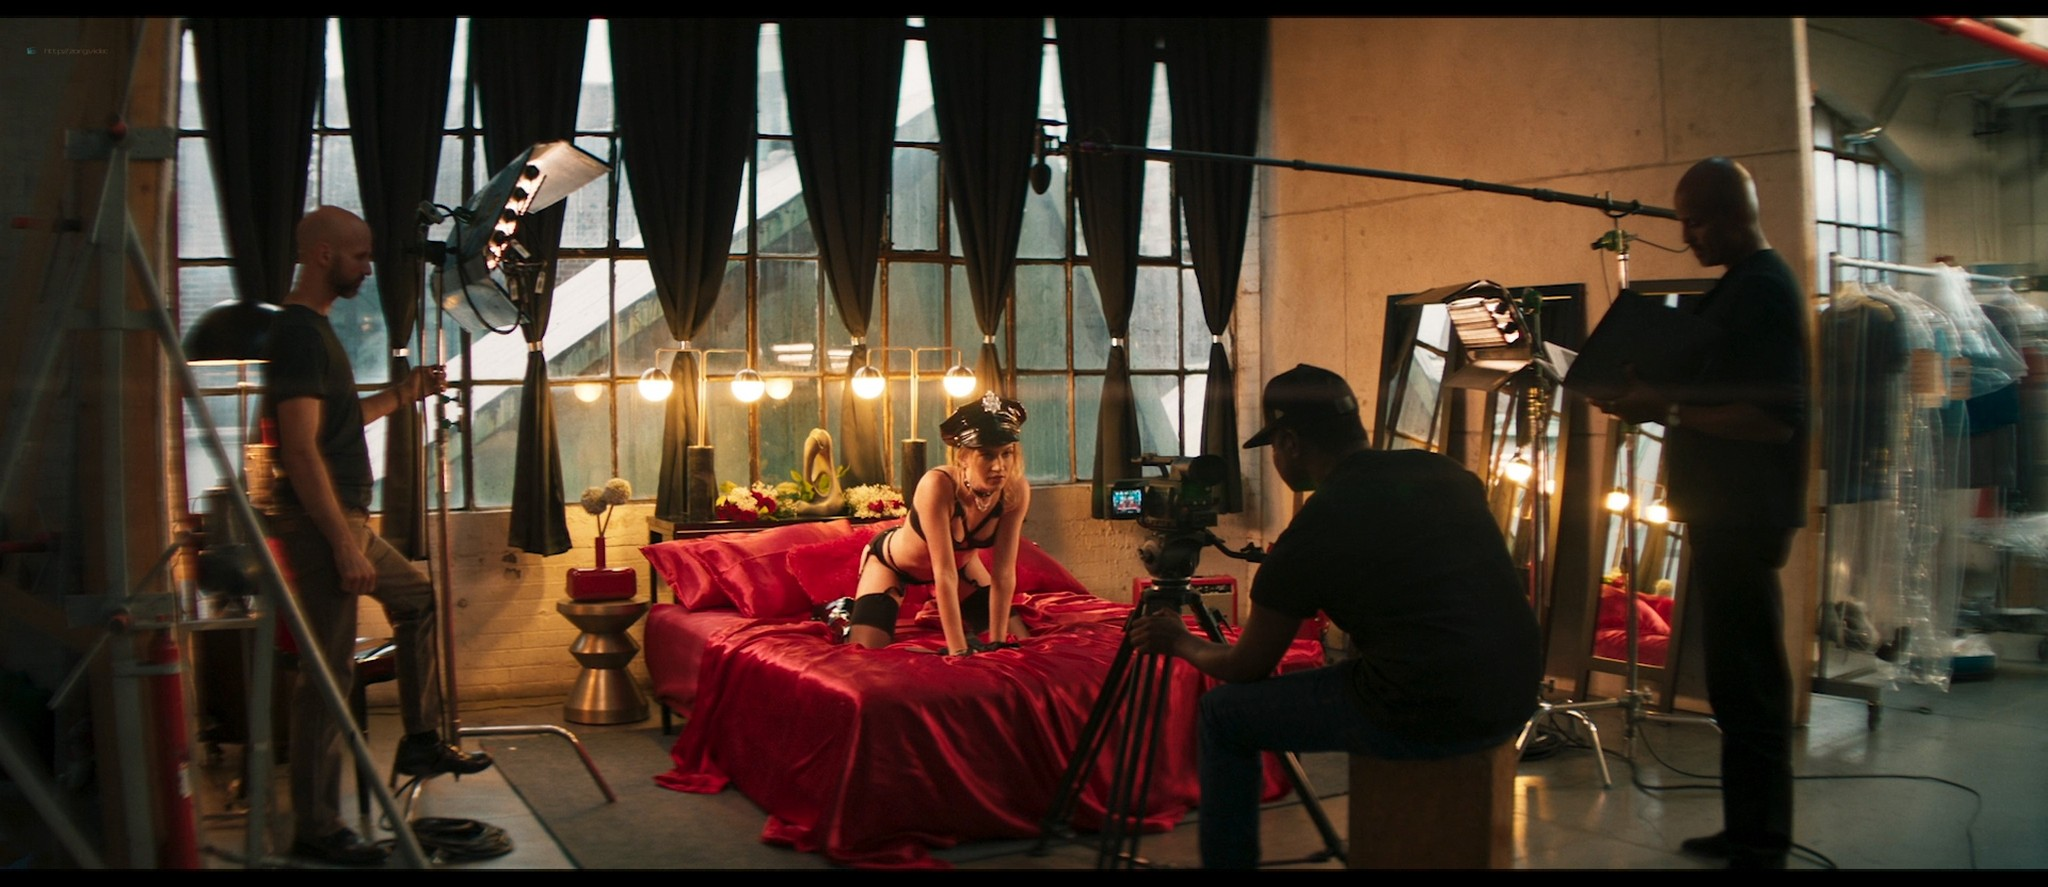 Ellen Toland nude topless Katie Claire McGrath sex doggy style - Inside the Rain (2019) HD 1080p Web (8)